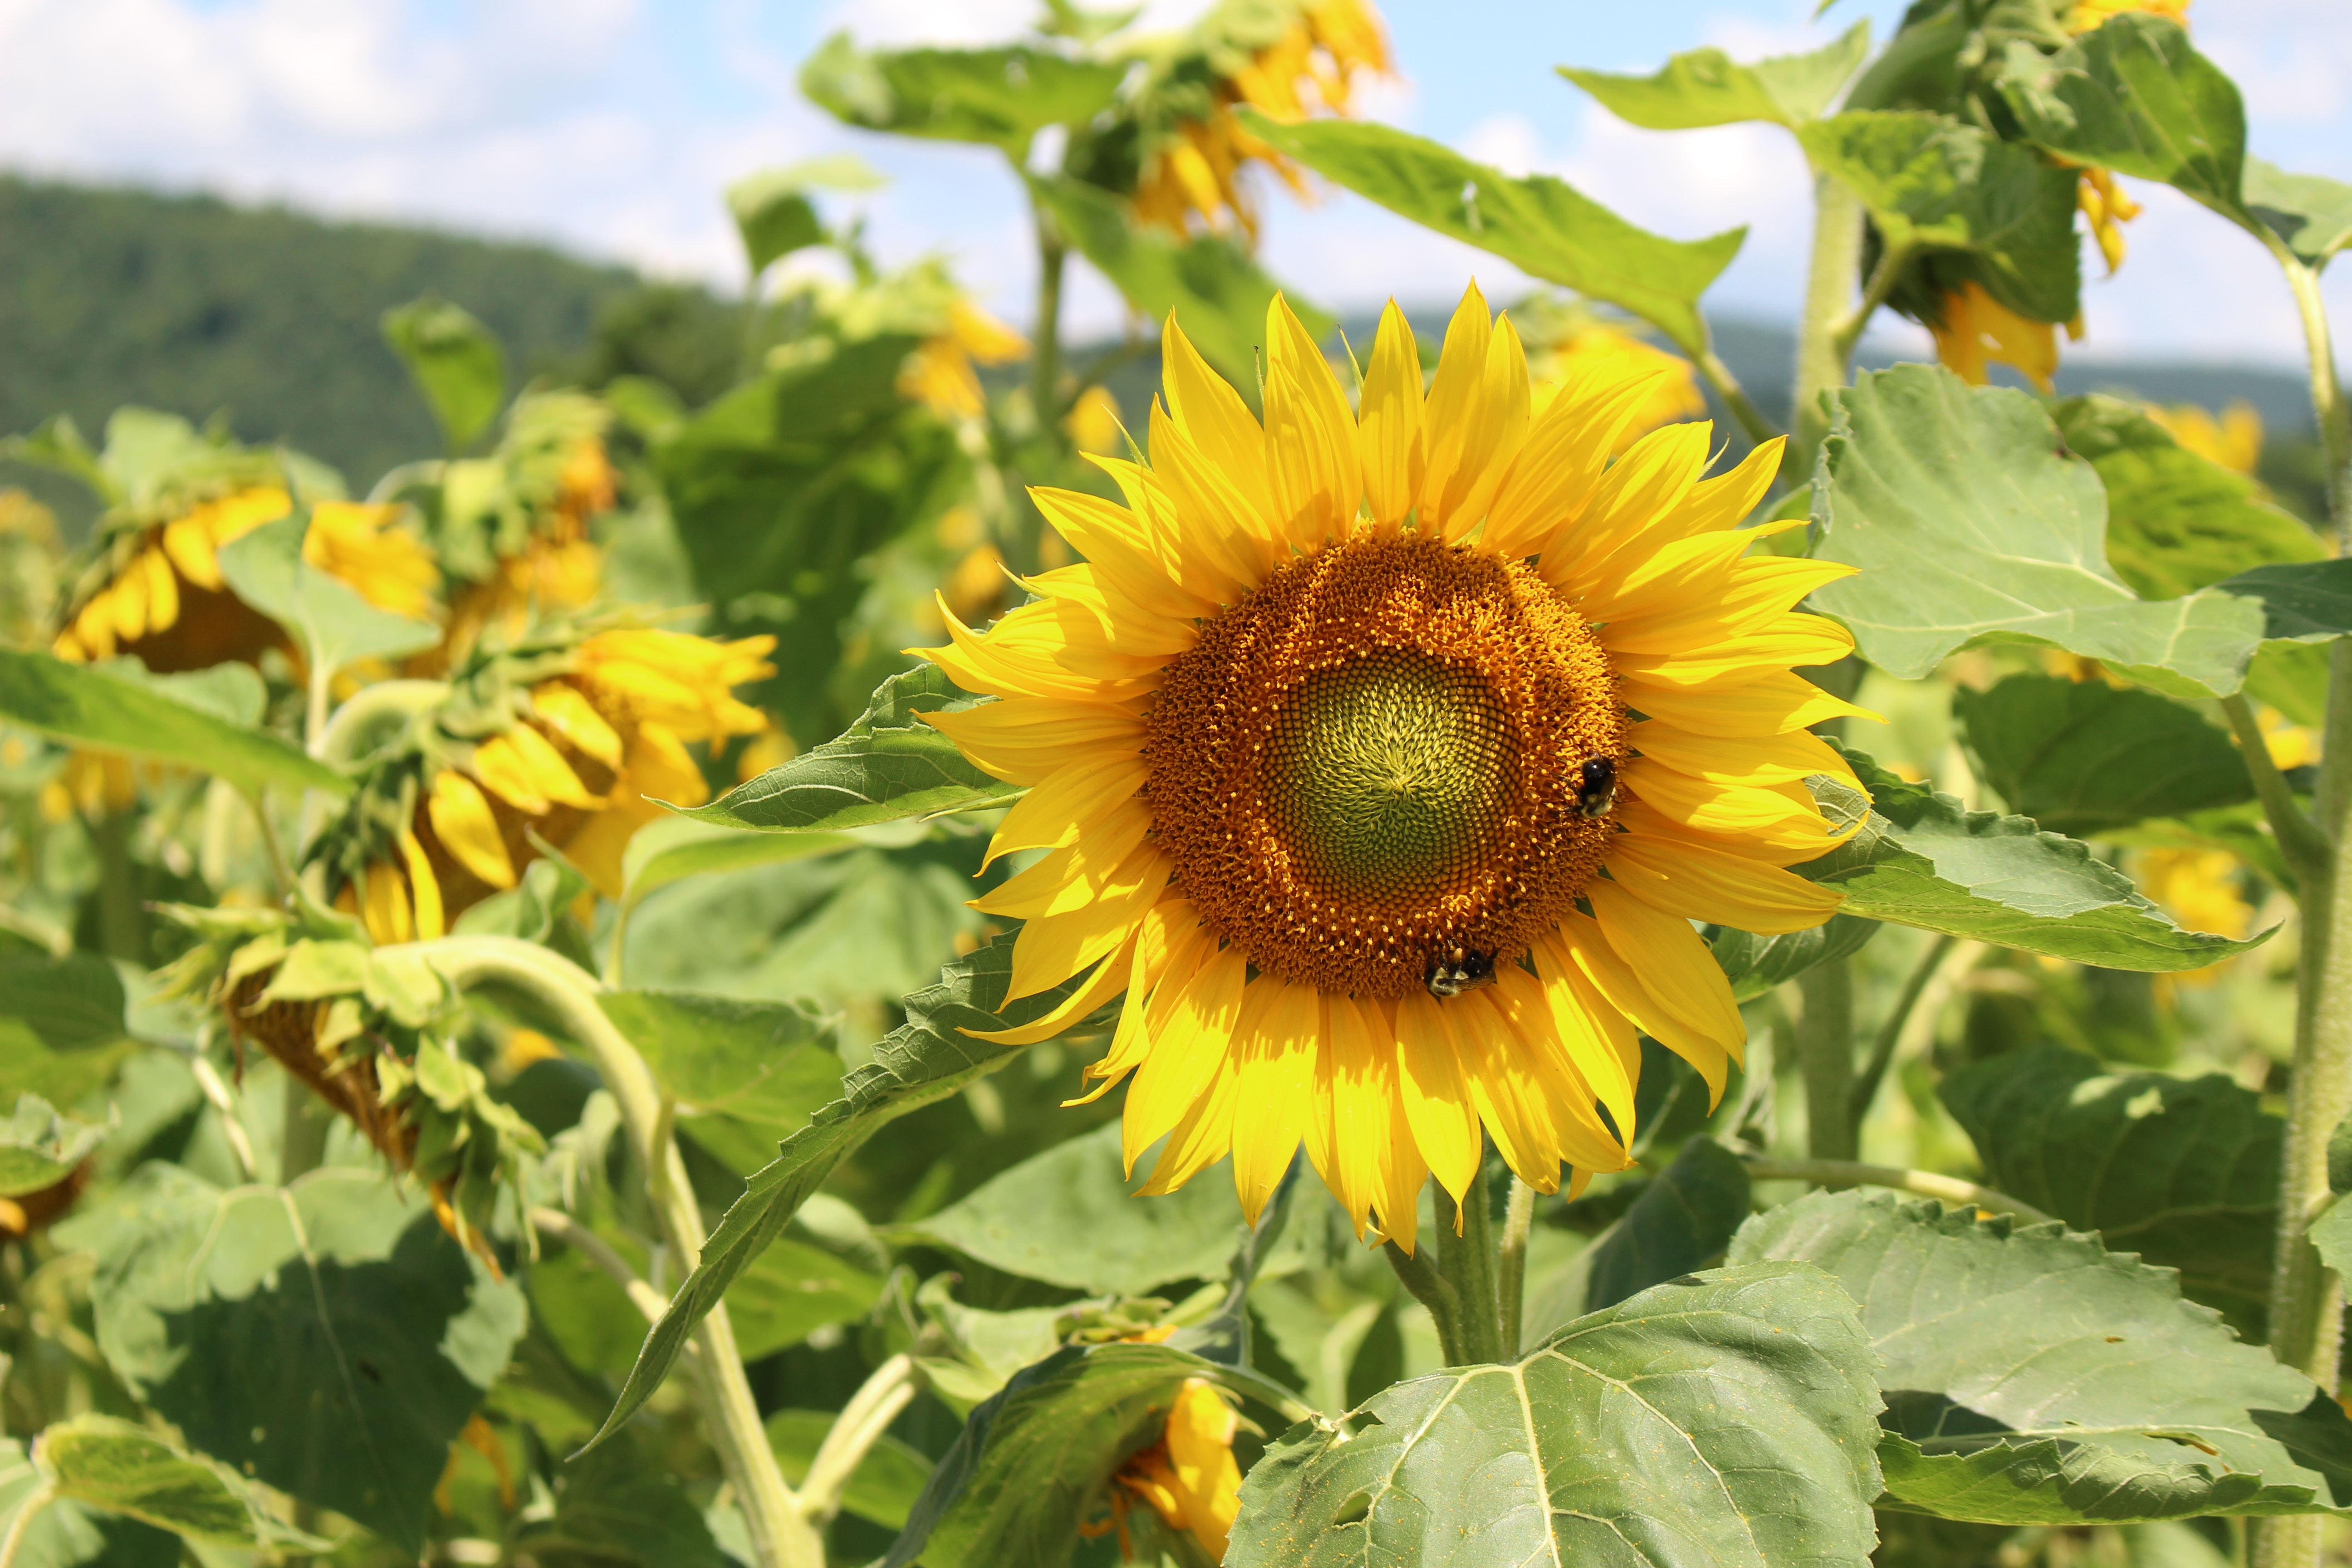 Sunflower Field in New York